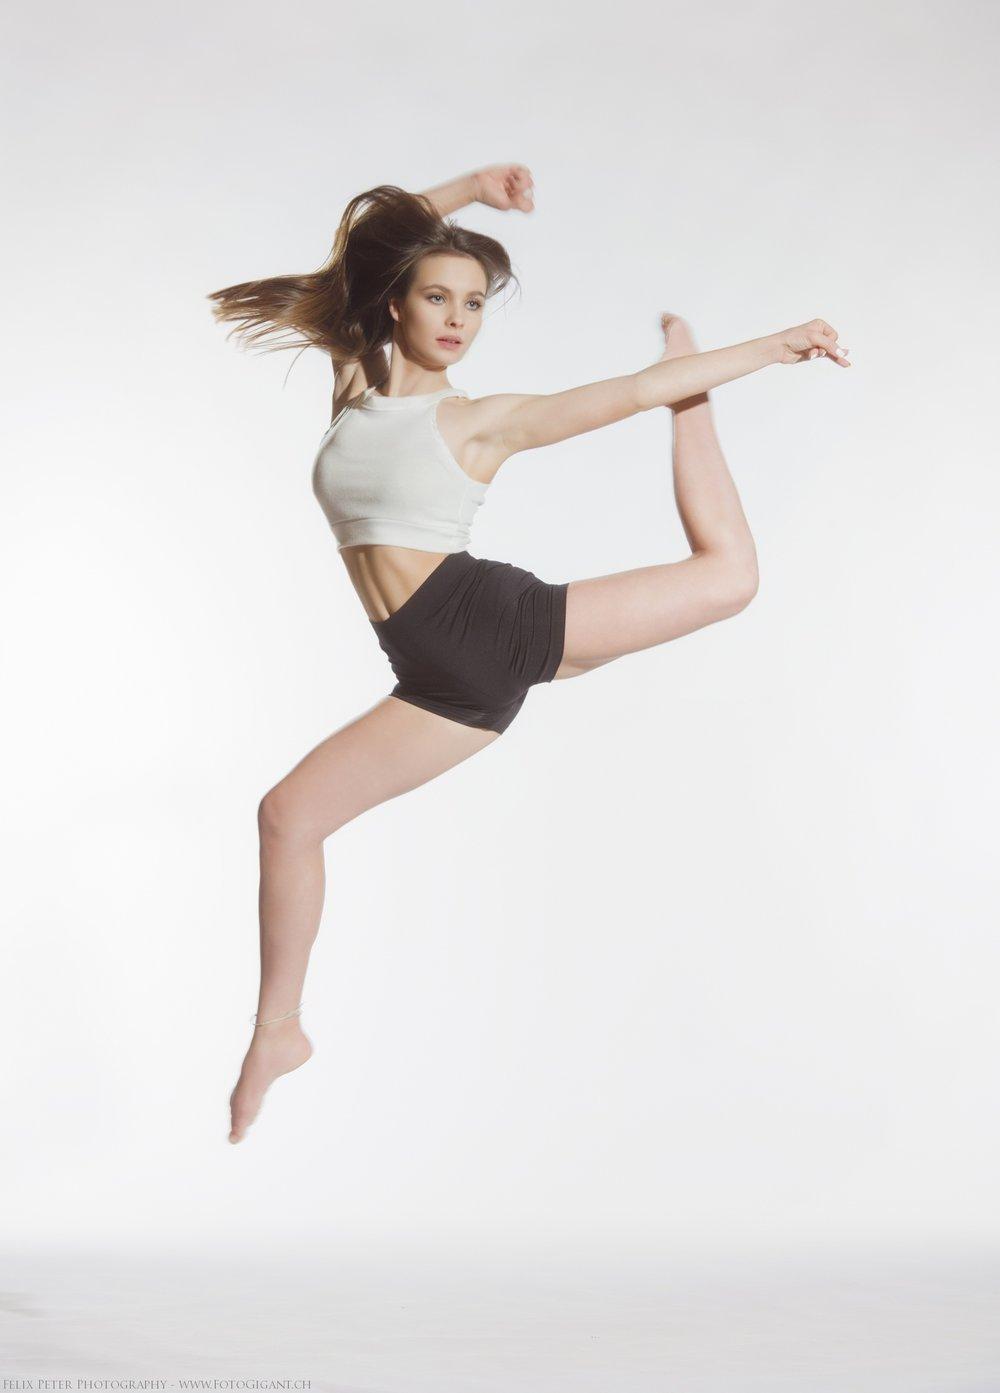 Felix-Peter-Yoga-Pilates-Dance-Fotografie_Bern_119.jpg